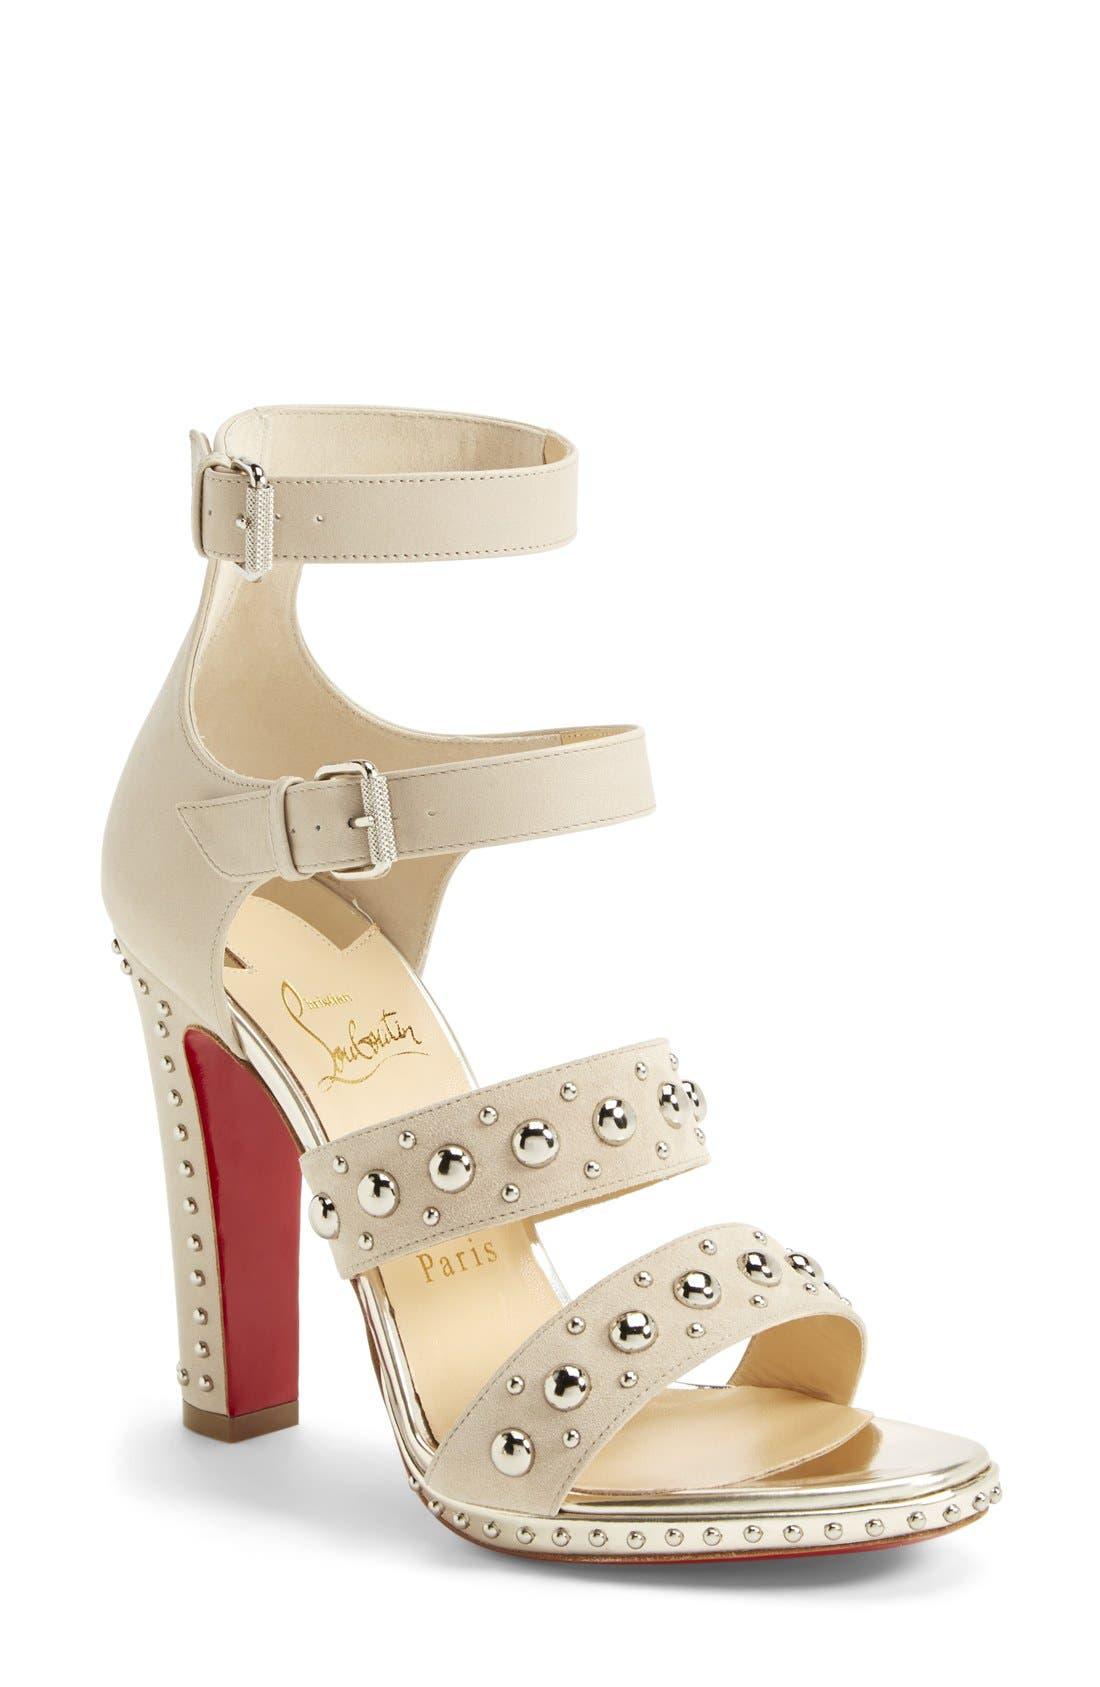 Alternate Image 1 Selected - Christian Louboutin Studded Sandal